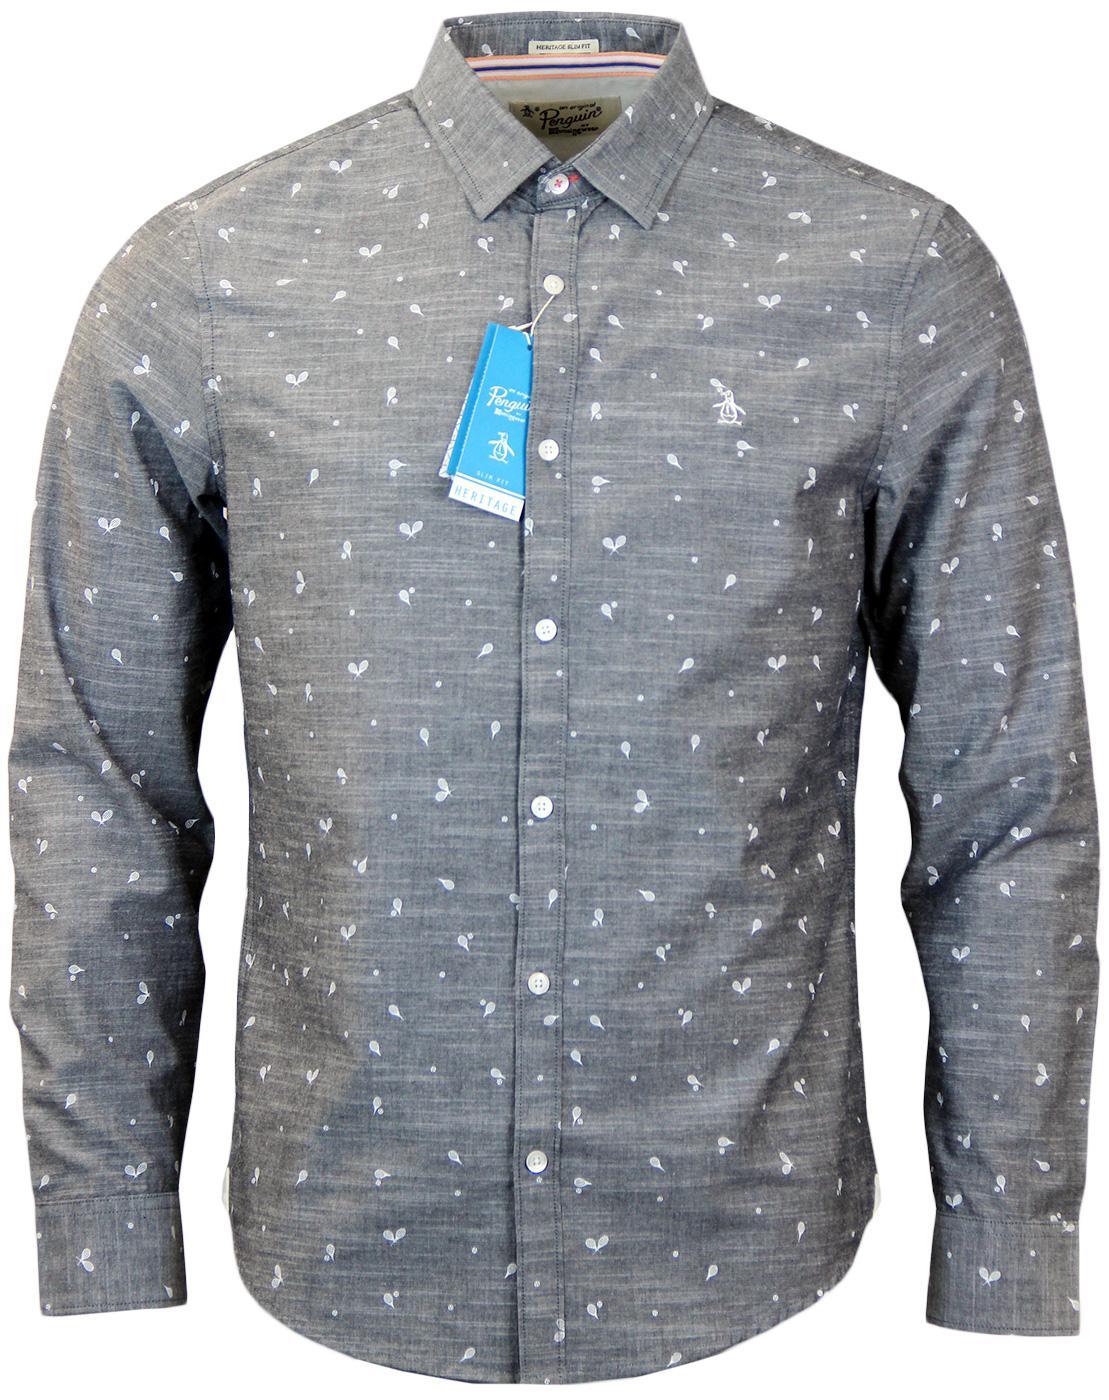 Deuce ORIGINAL PENGUIN Chambray Mini Racquet Shirt